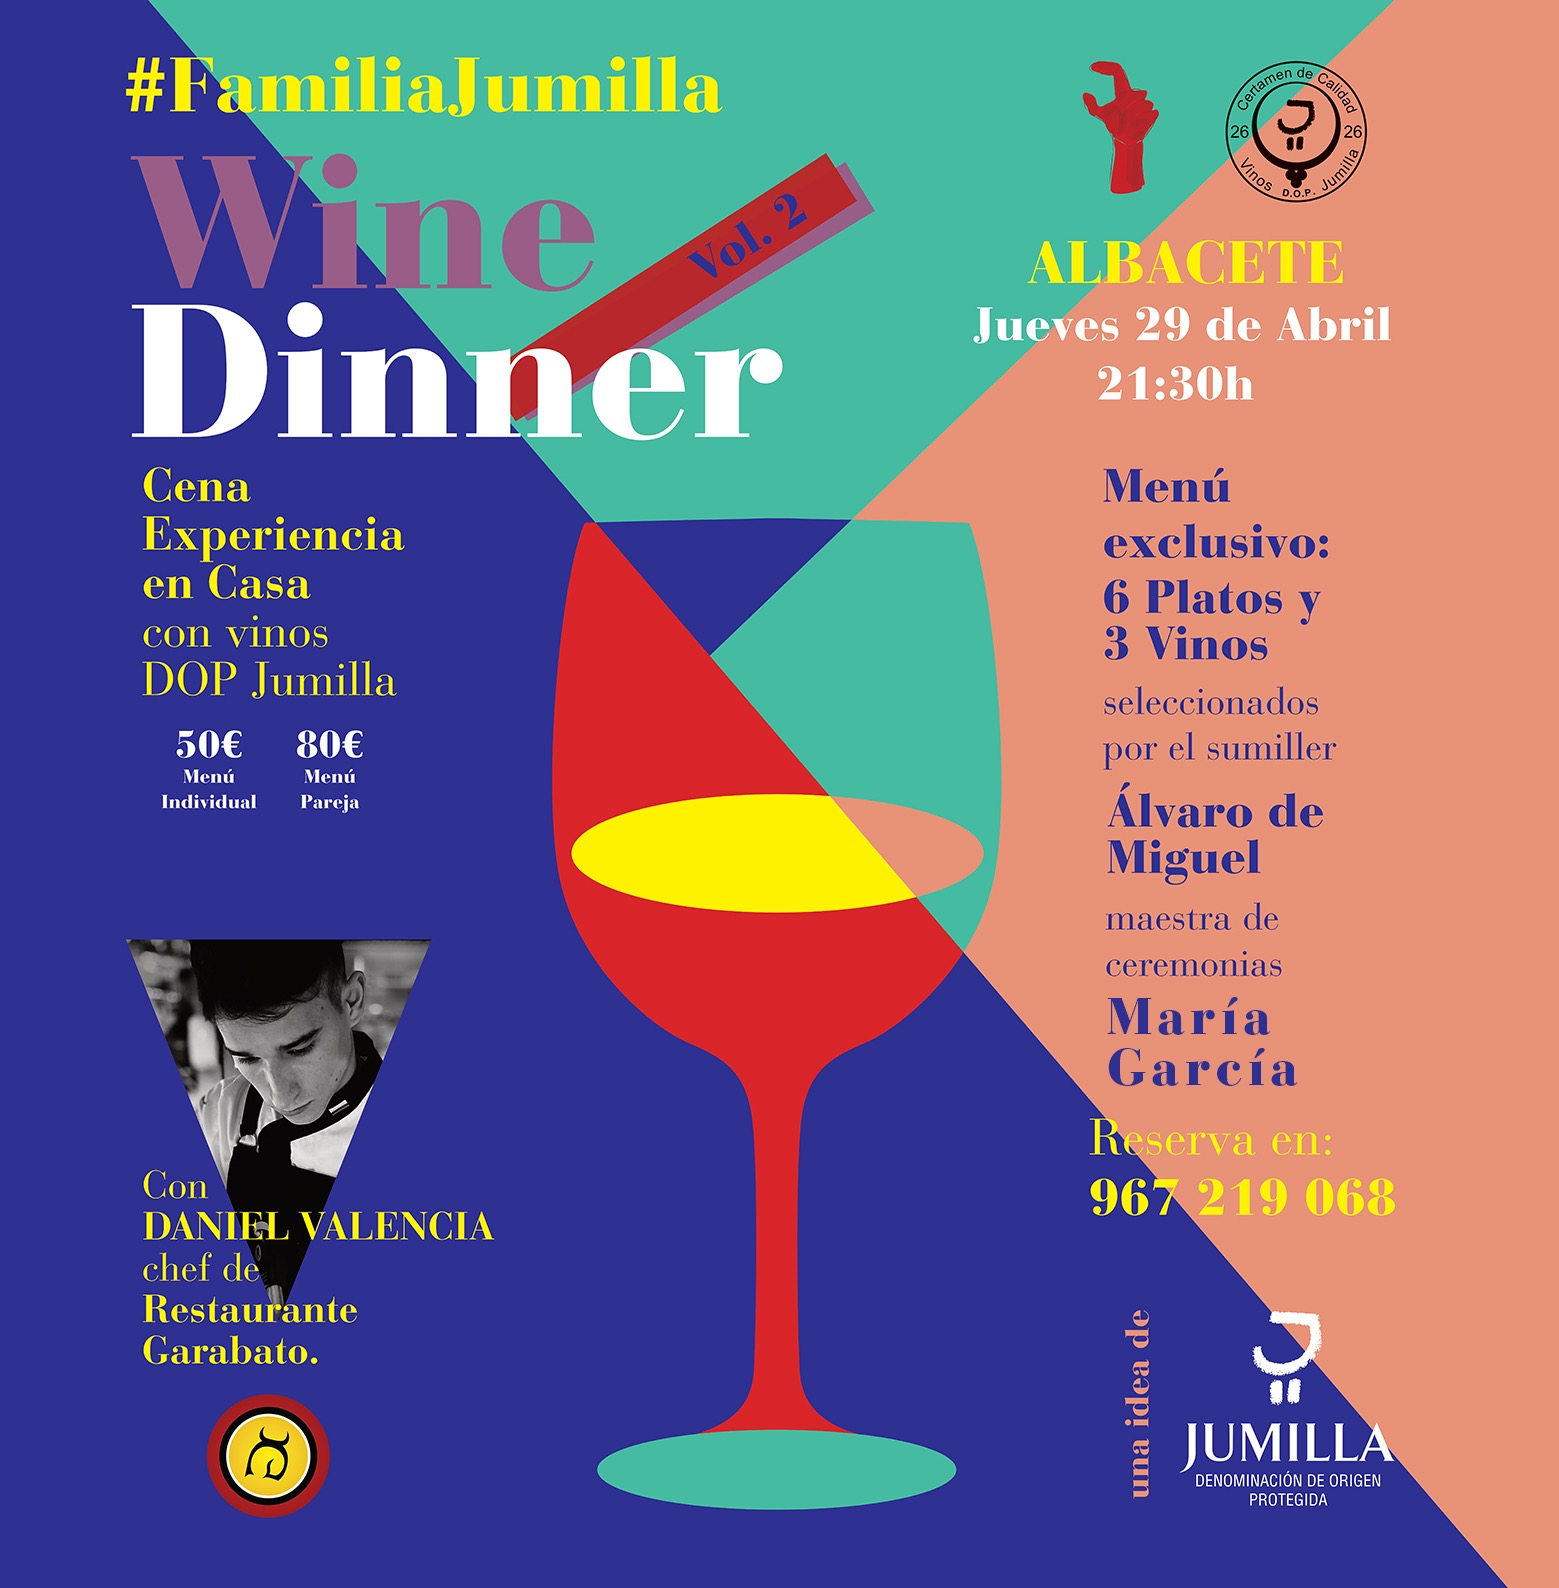 Jumilla WineDinner Rest. Garabato Albacete